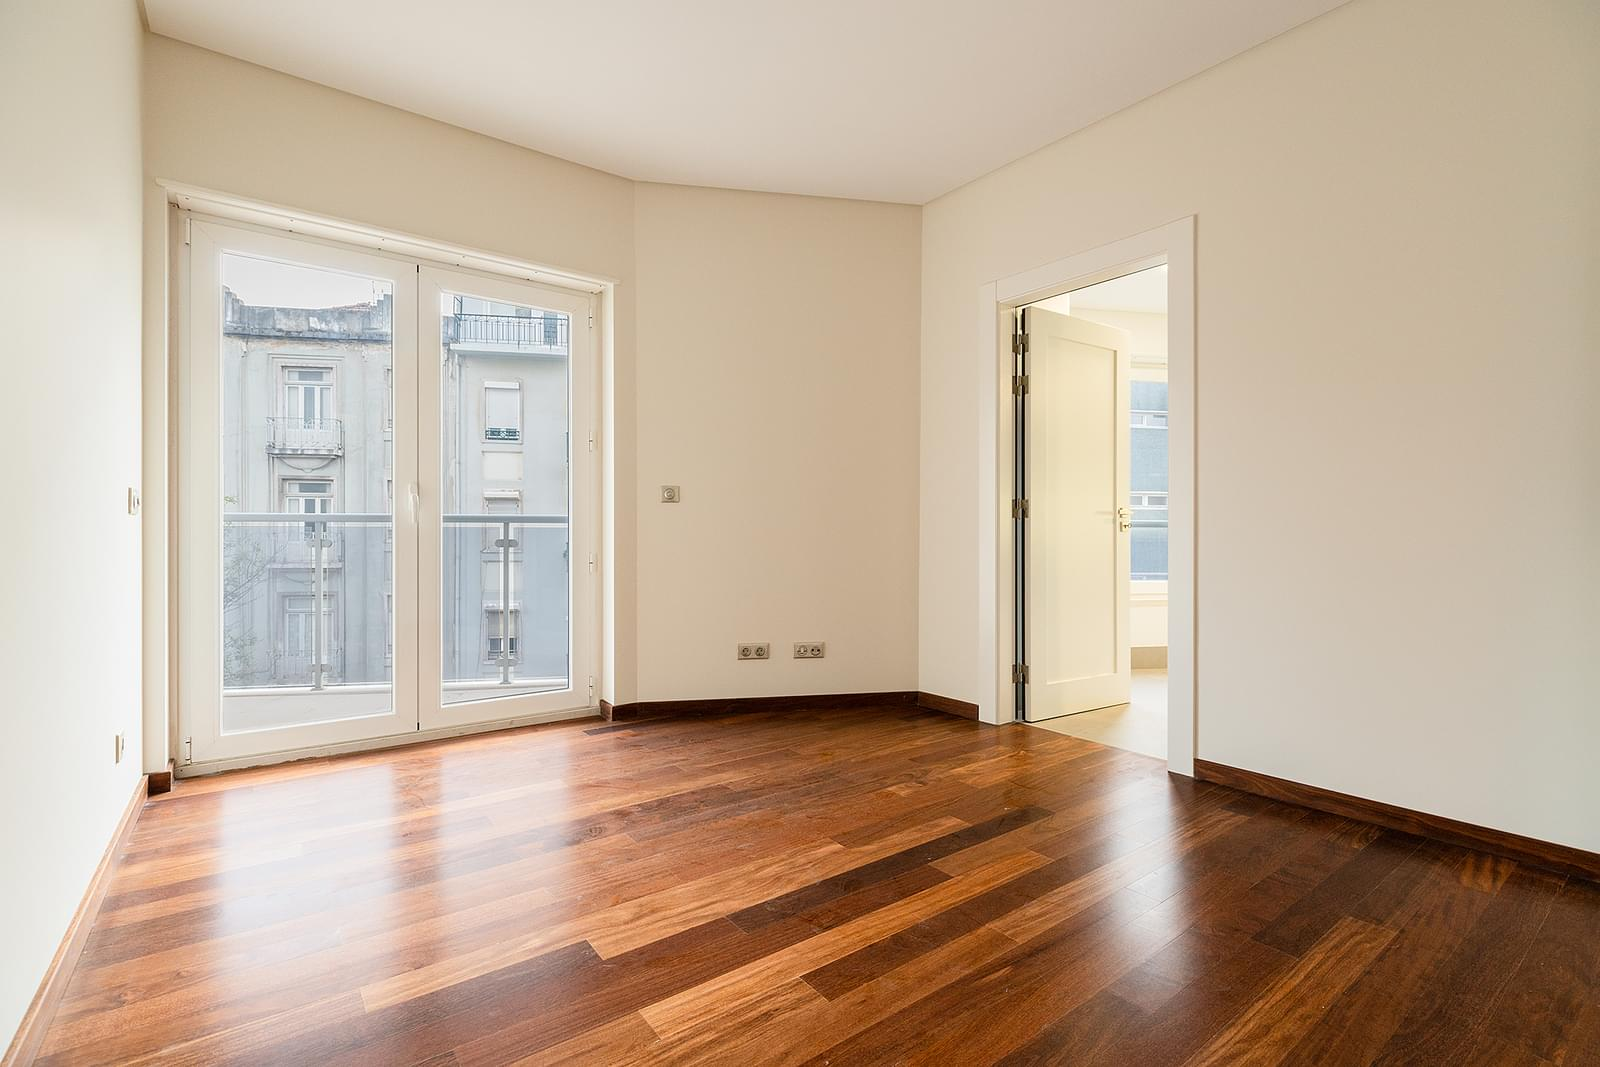 pf18533-apartamento-t4-lisboa-3ac4ac31-7e00-4d7b-81ac-1cb371dd2c91